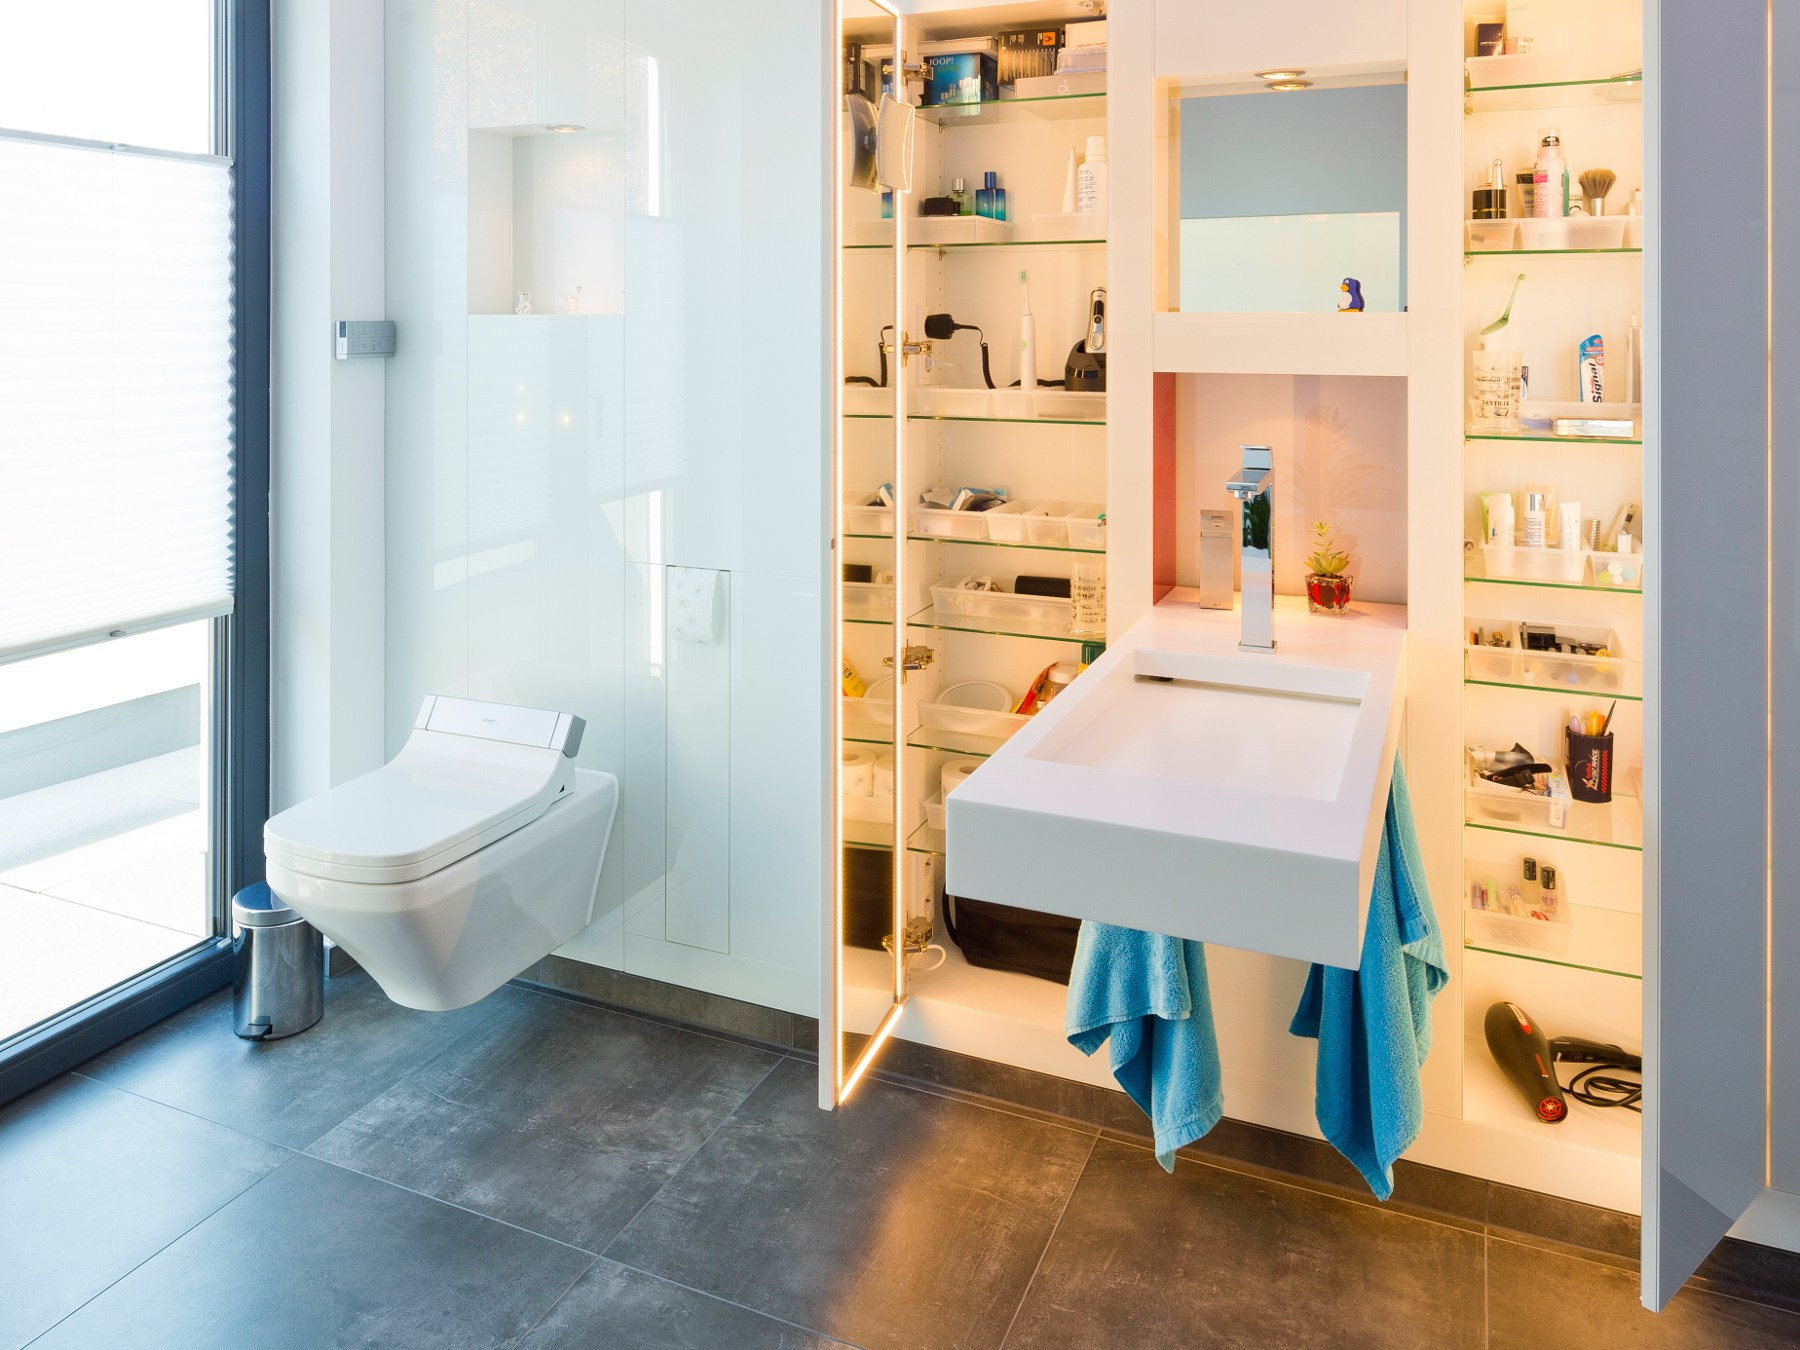 salle de bains compl te by baqua design j rgen klein. Black Bedroom Furniture Sets. Home Design Ideas